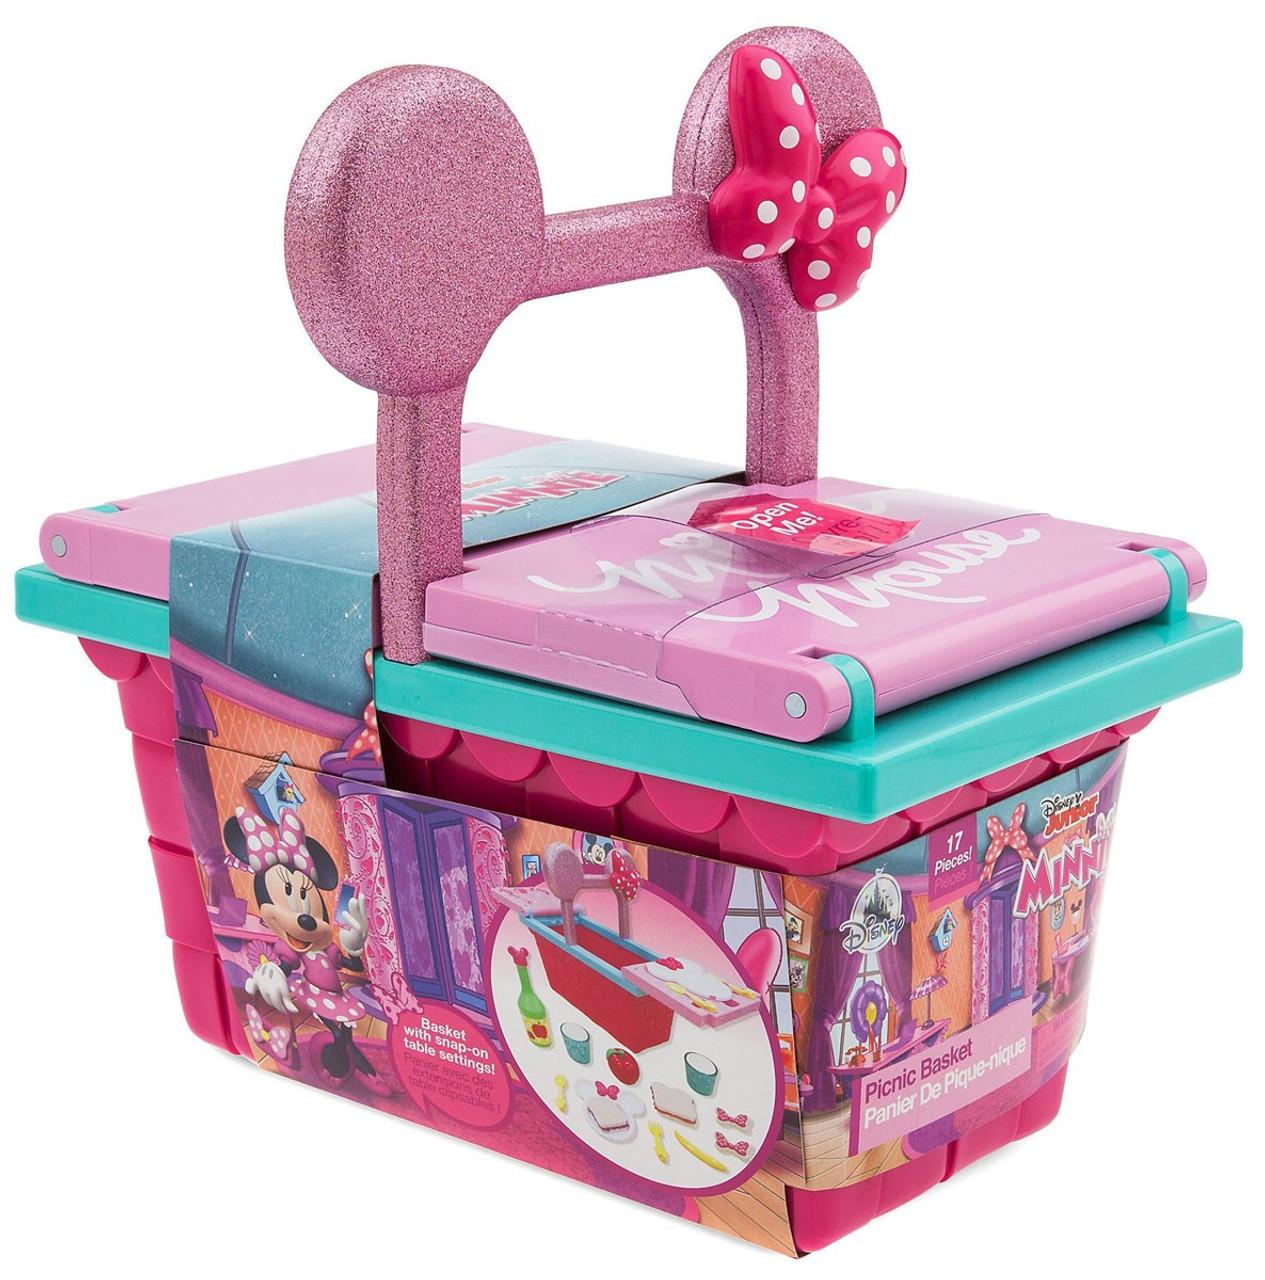 d599c3b5b597 Disney Minnie Mouse Picnic Basket Exclusive Playset [2019]